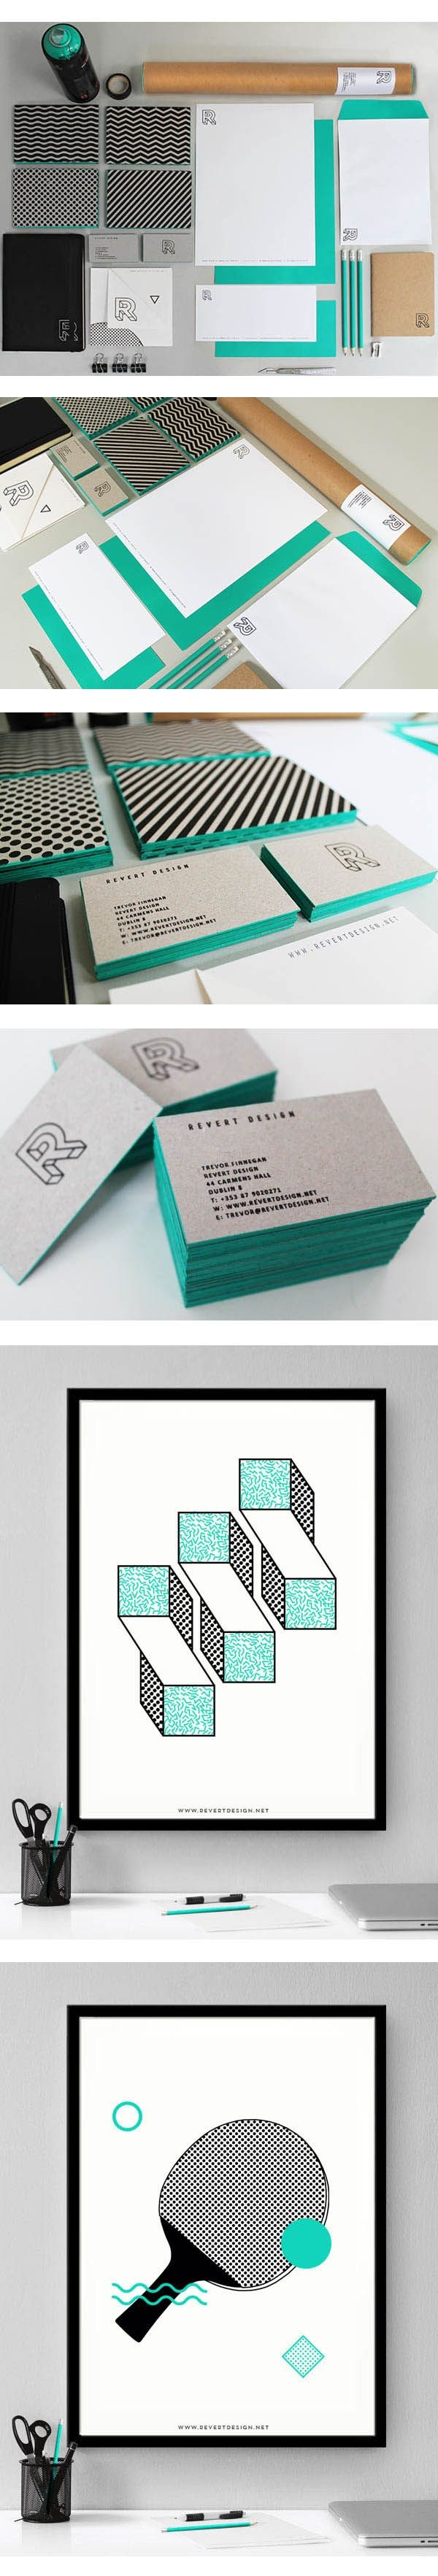 Stay Creative blog | 15 creative branding and identity project | http://staycreativeblog.com